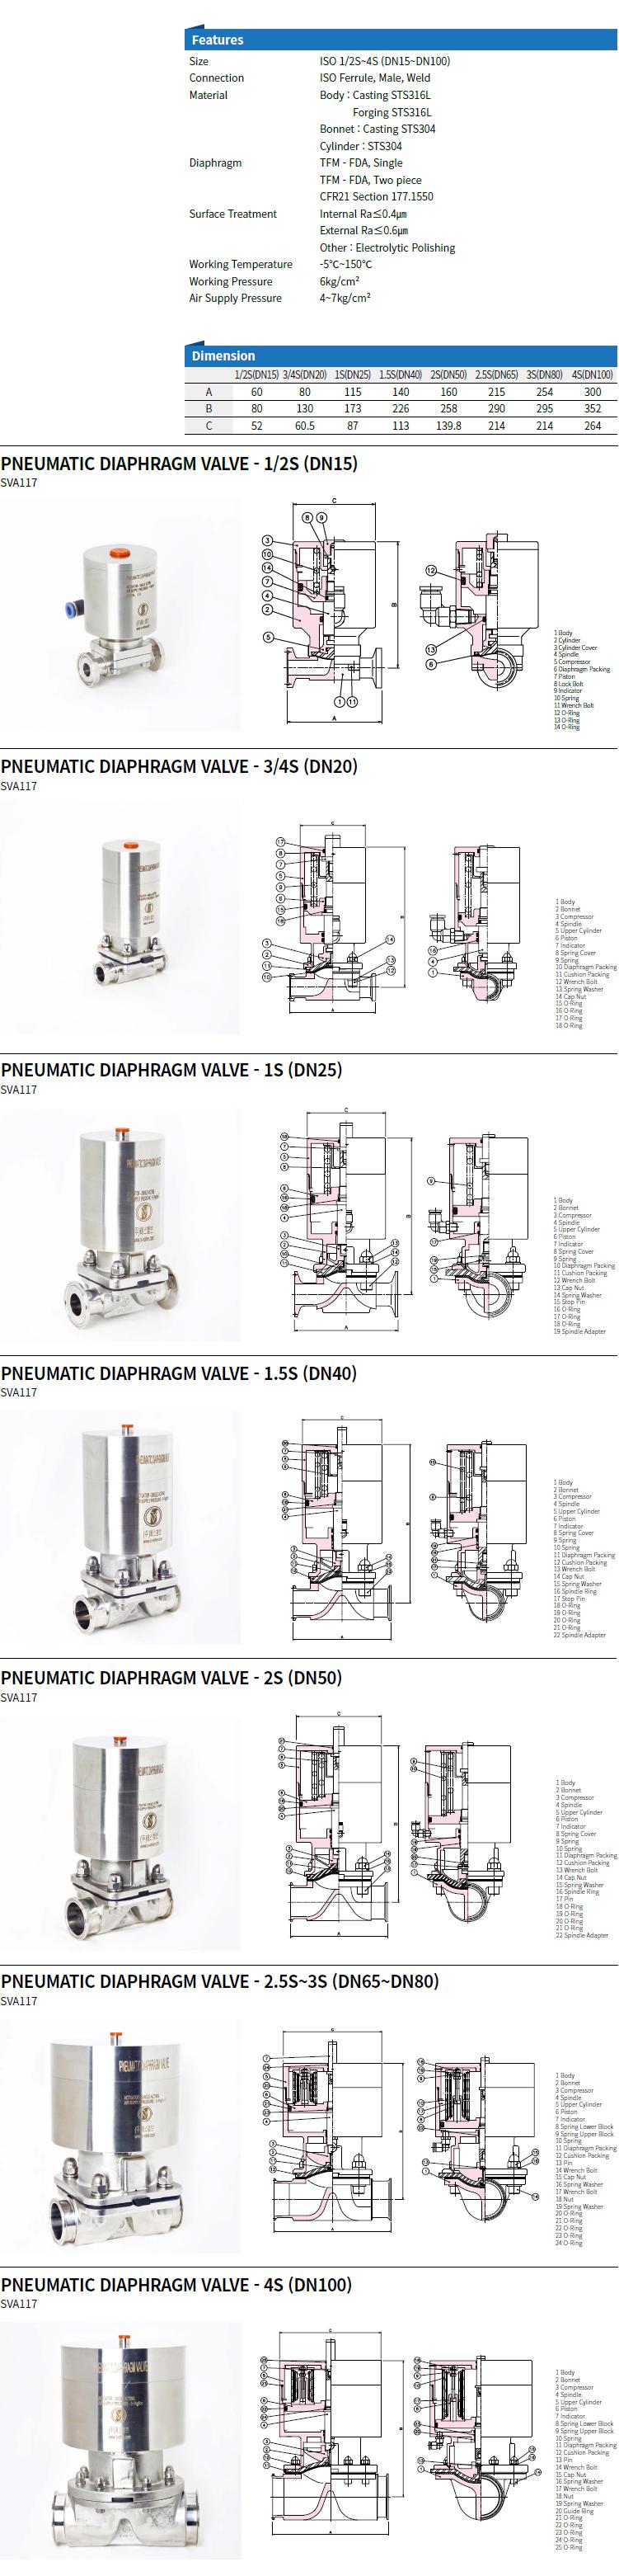 S-Valve Pneumatic Diaphragm Valves SVA117